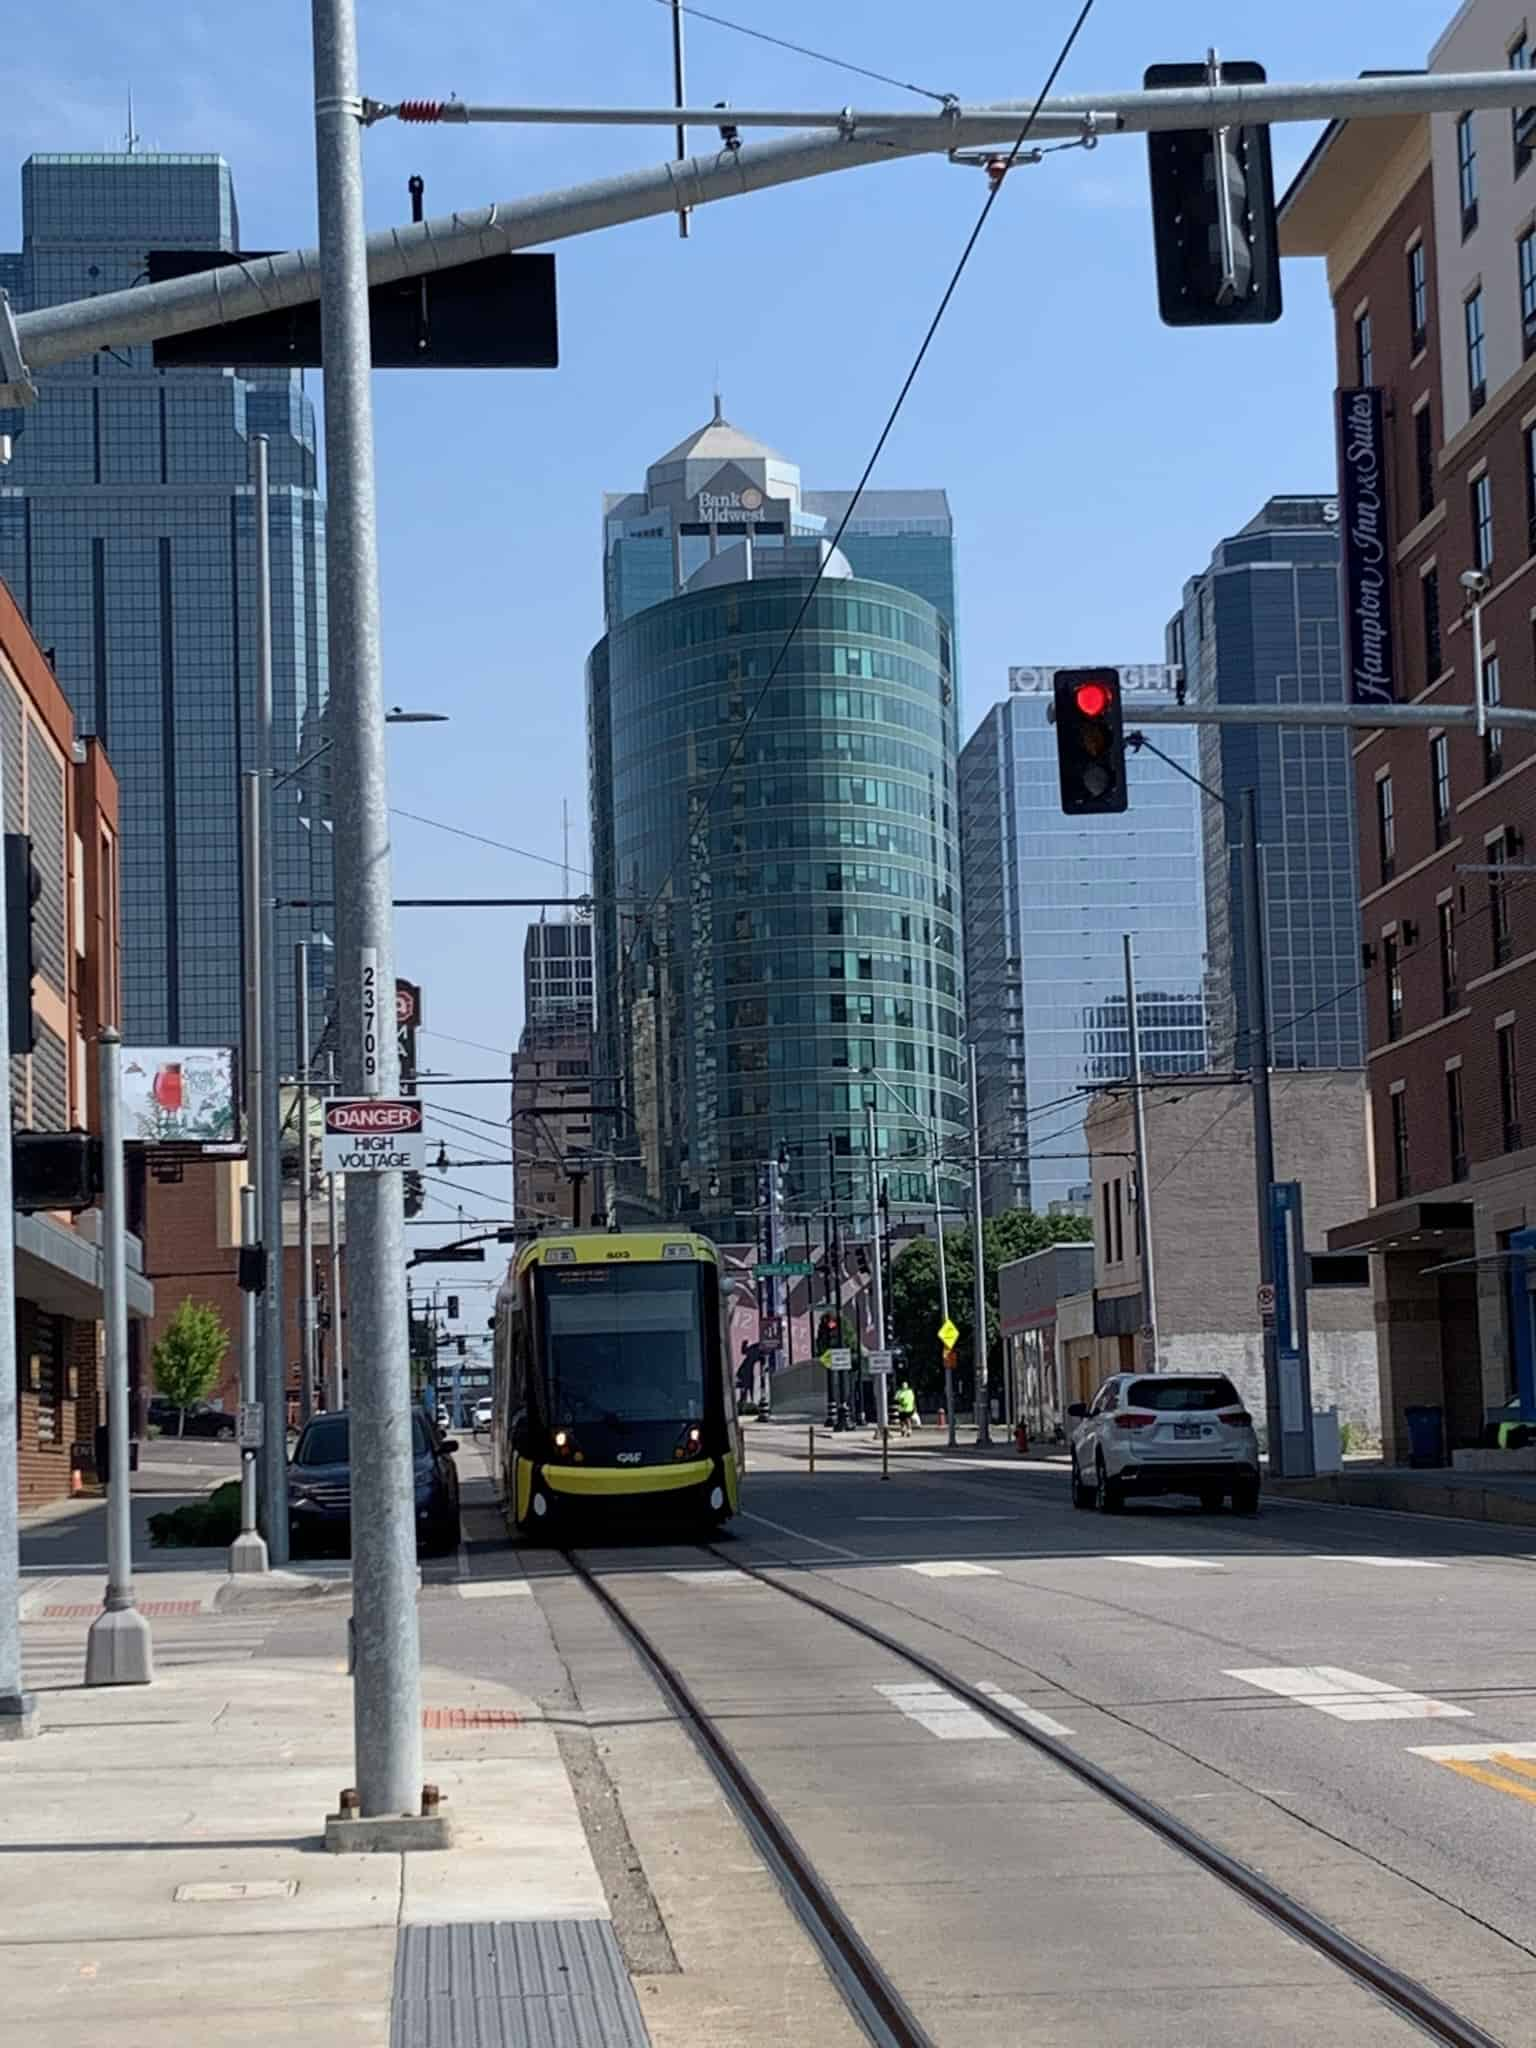 streetcar in Kansas City